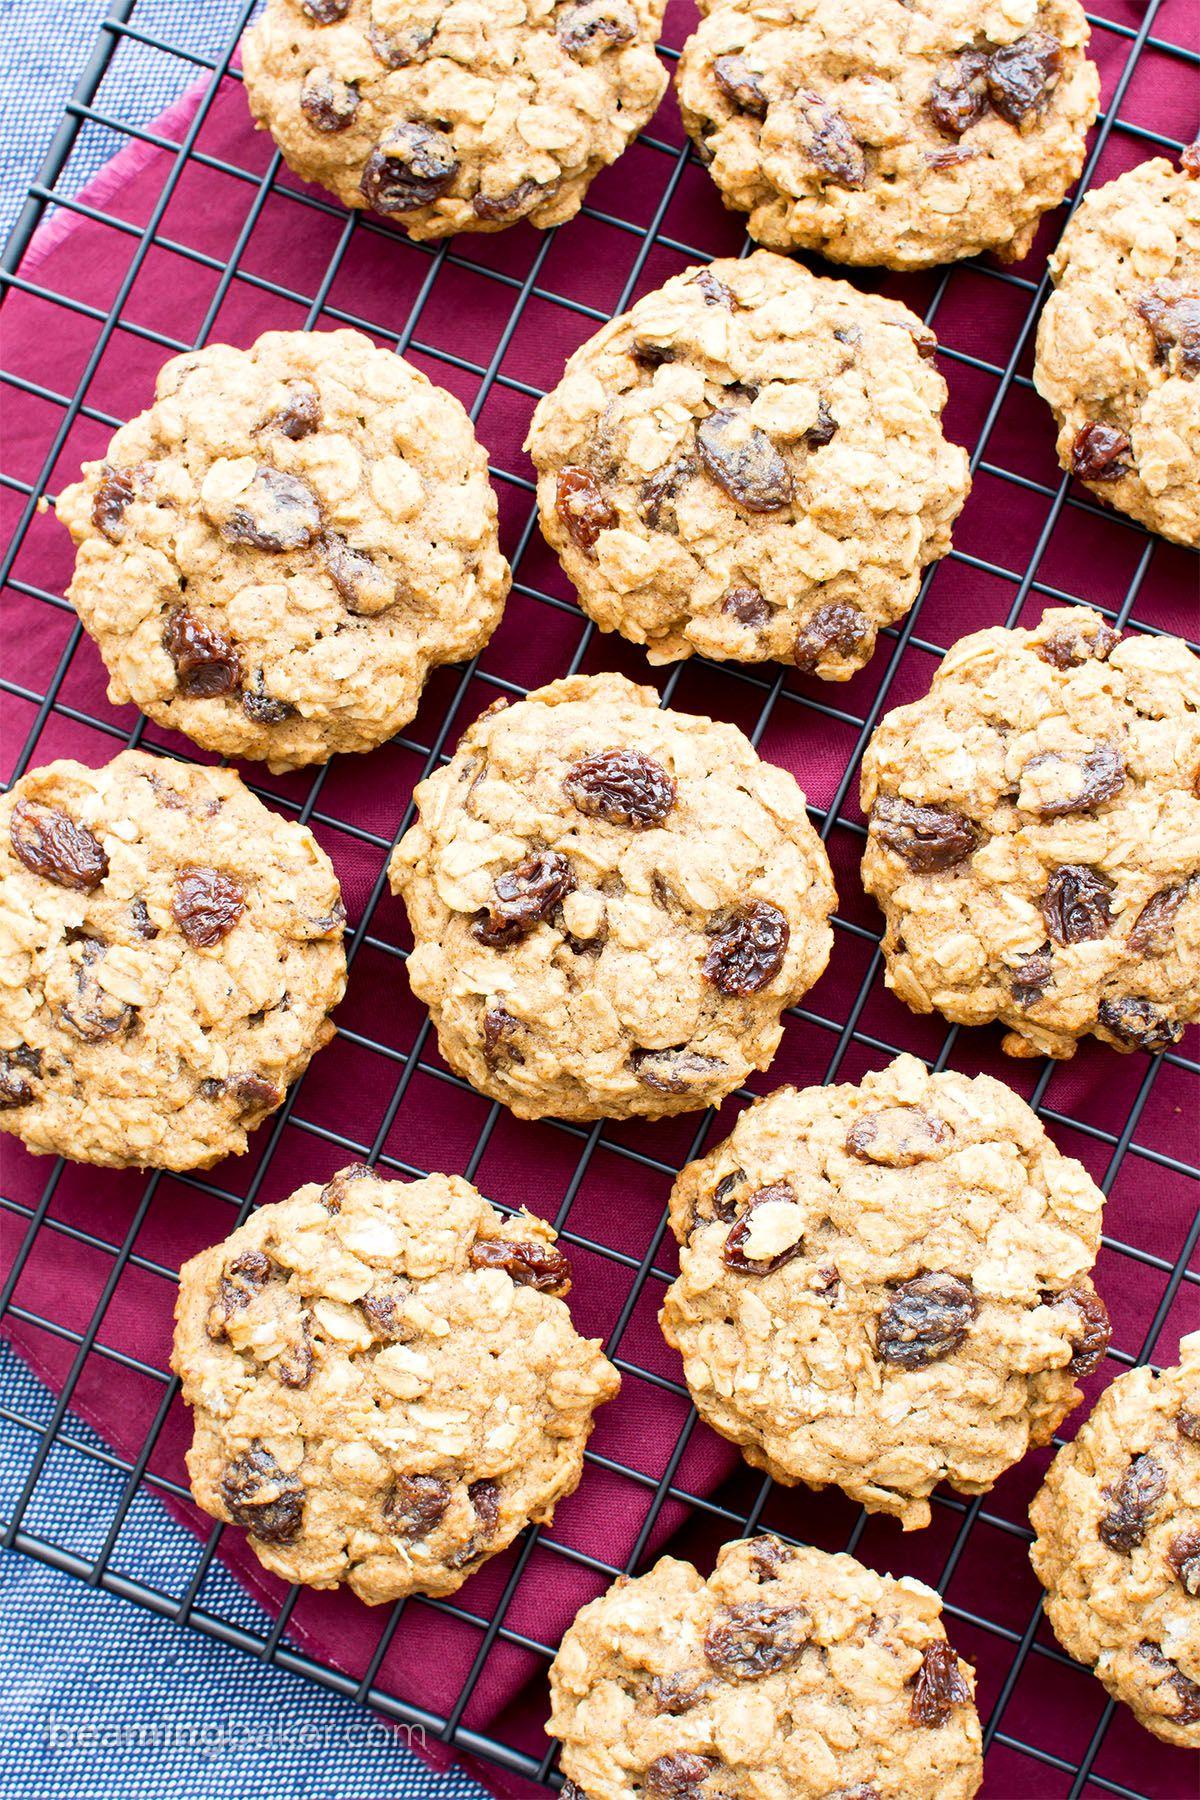 Easy Gluten Free Vegan Oatmeal Raisin Cookies V Gf Df An Easy Recipe For Sof Vegan Oatmeal Raisin Cookies Vegan Gluten Free Cookies Oatmeal Raisin Cookies